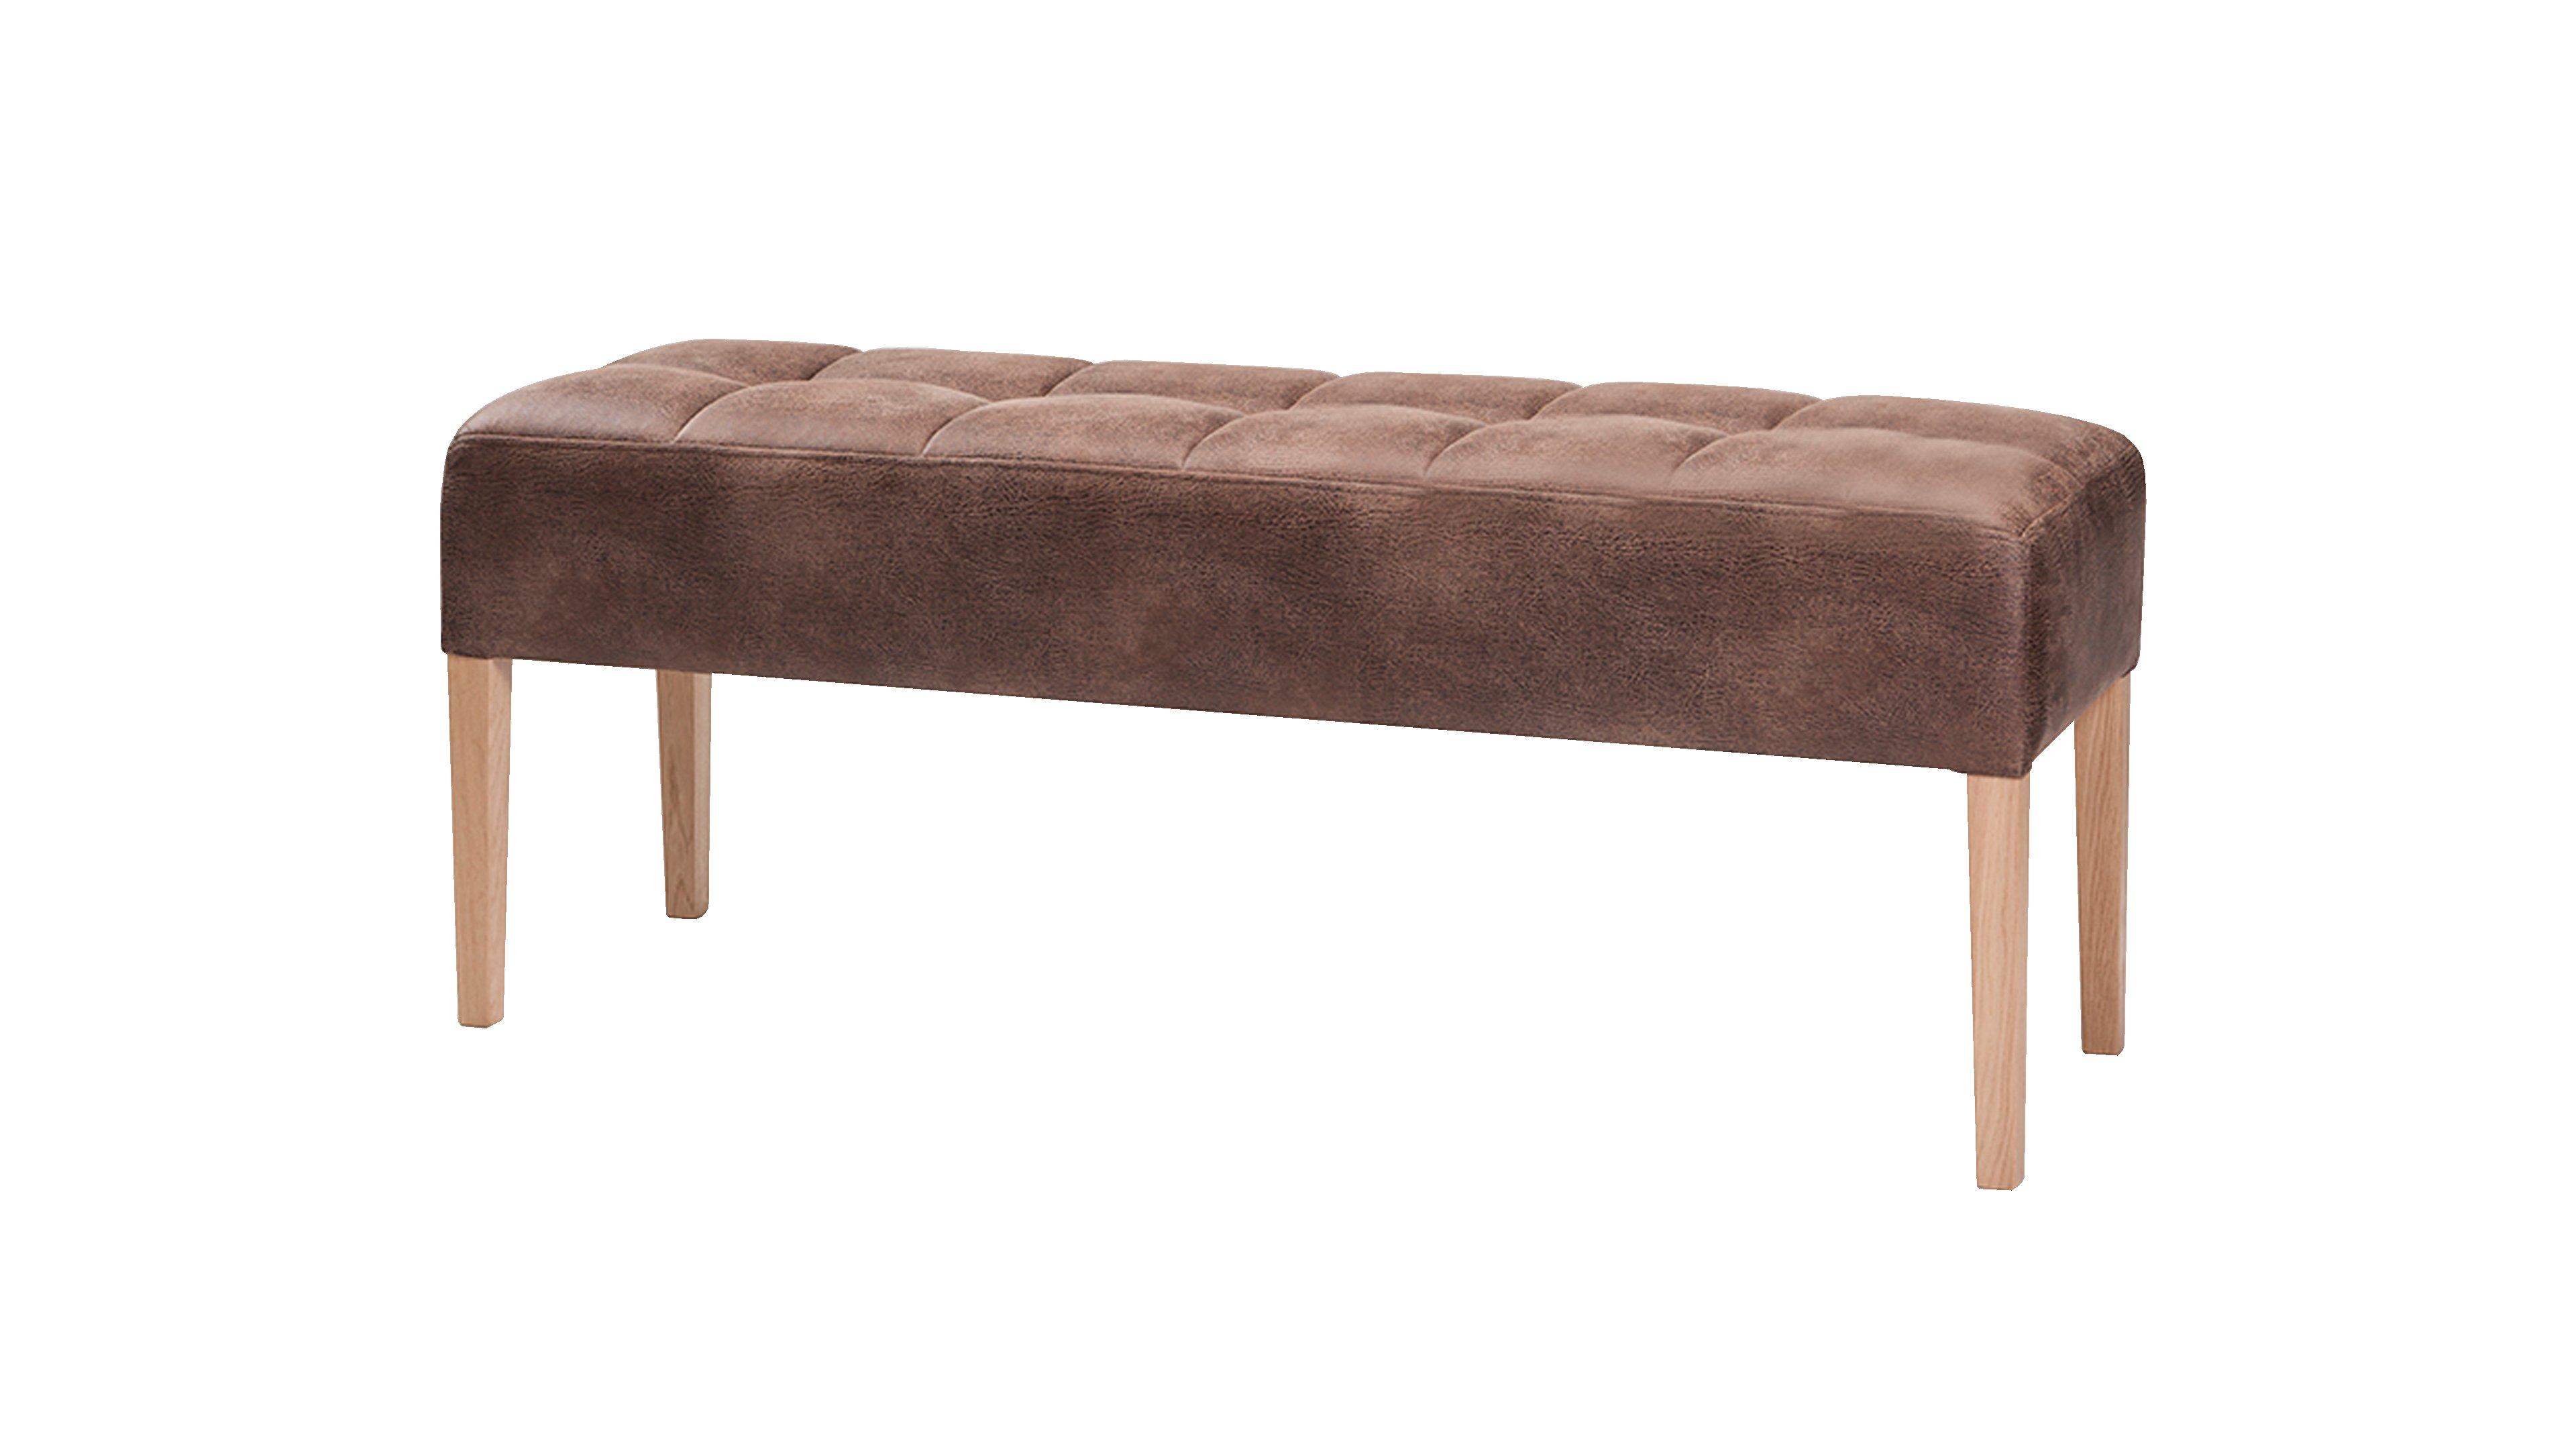 Sitzbank Marino Bench Holz/Eiche,Kunstfaser (Chemiefaser),KunstfaserChemiefaser/Polyester (PES),Stoff